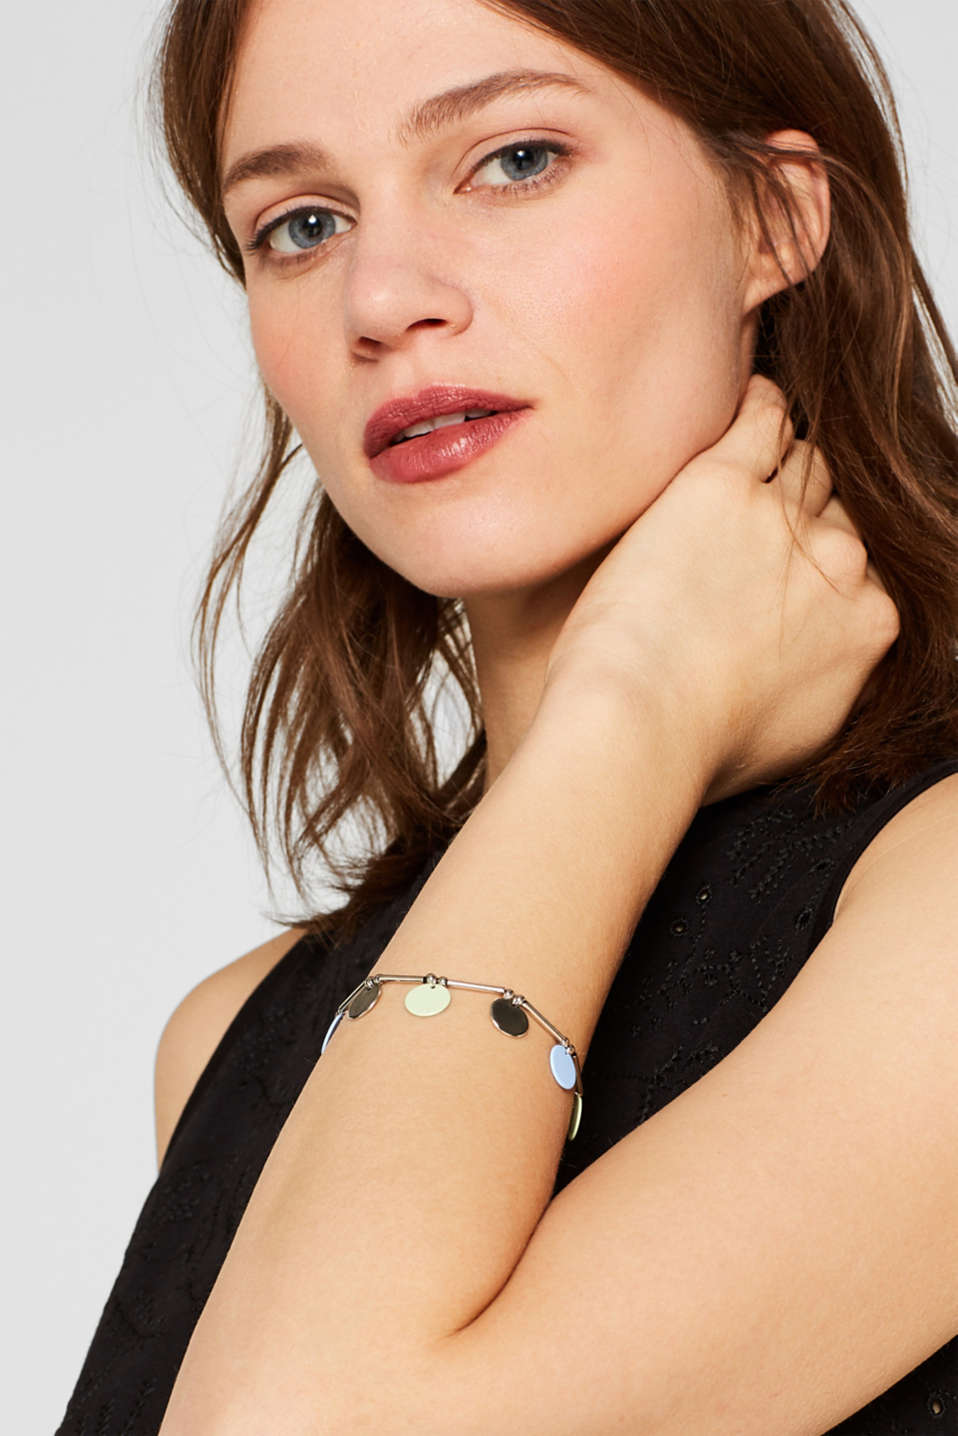 Bracelet with pendants, SILVER, detail image number 2